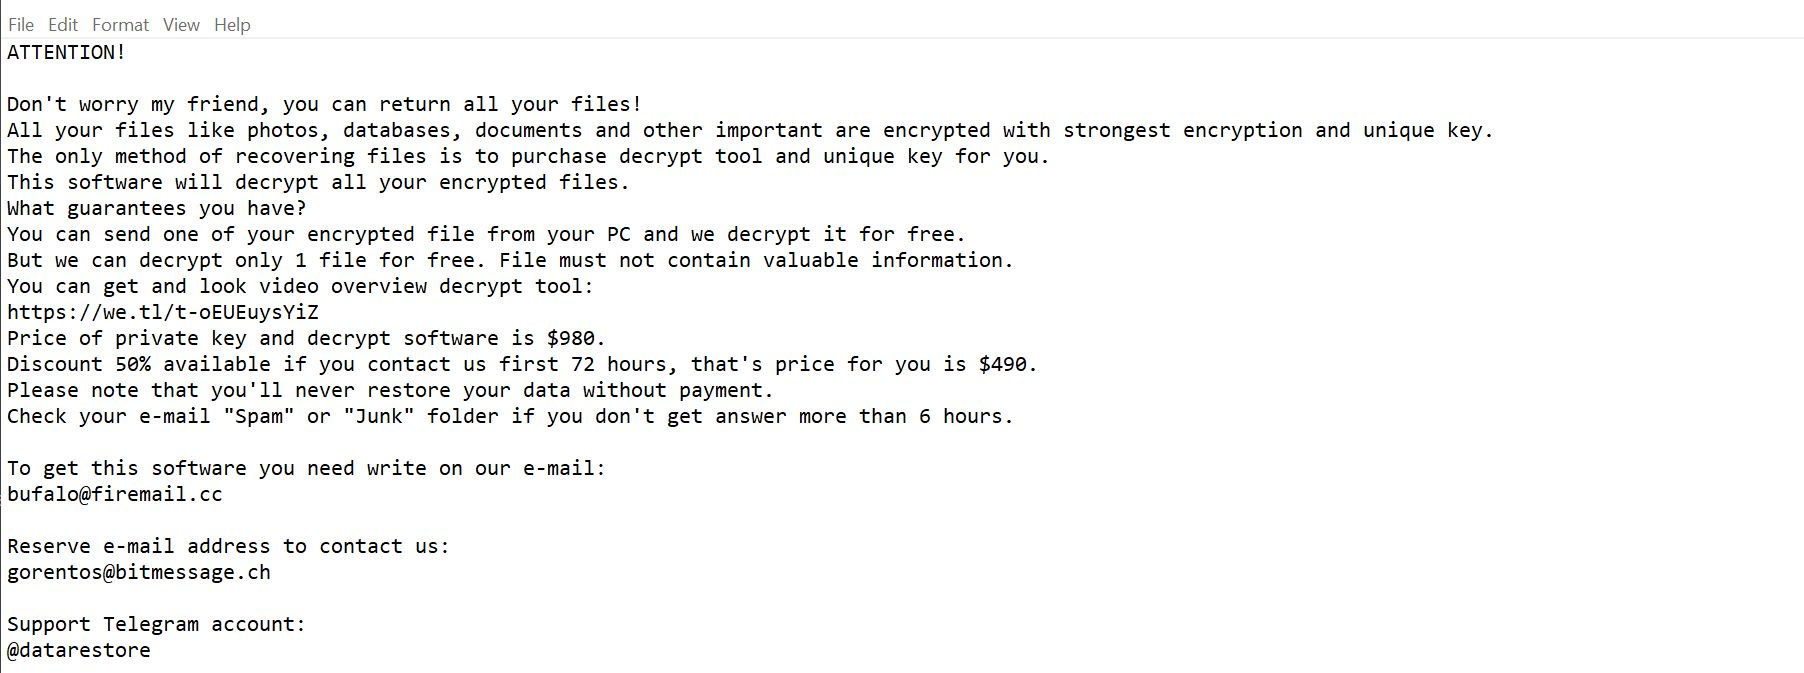 Ferosas ransomware